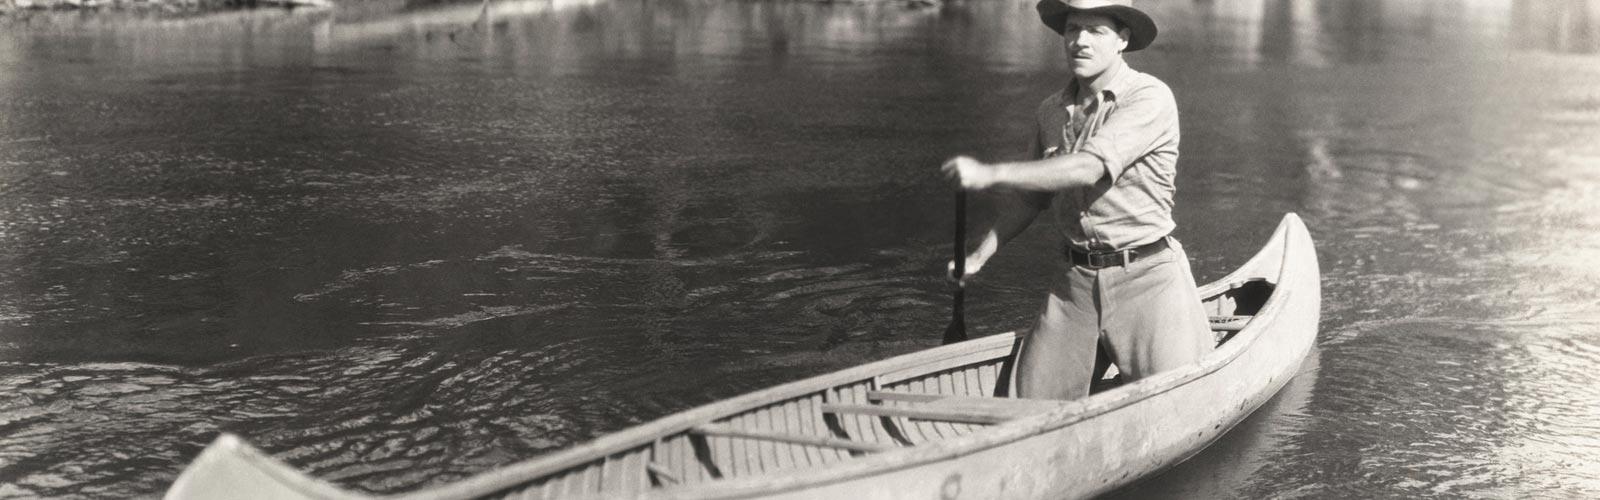 Canoeing History